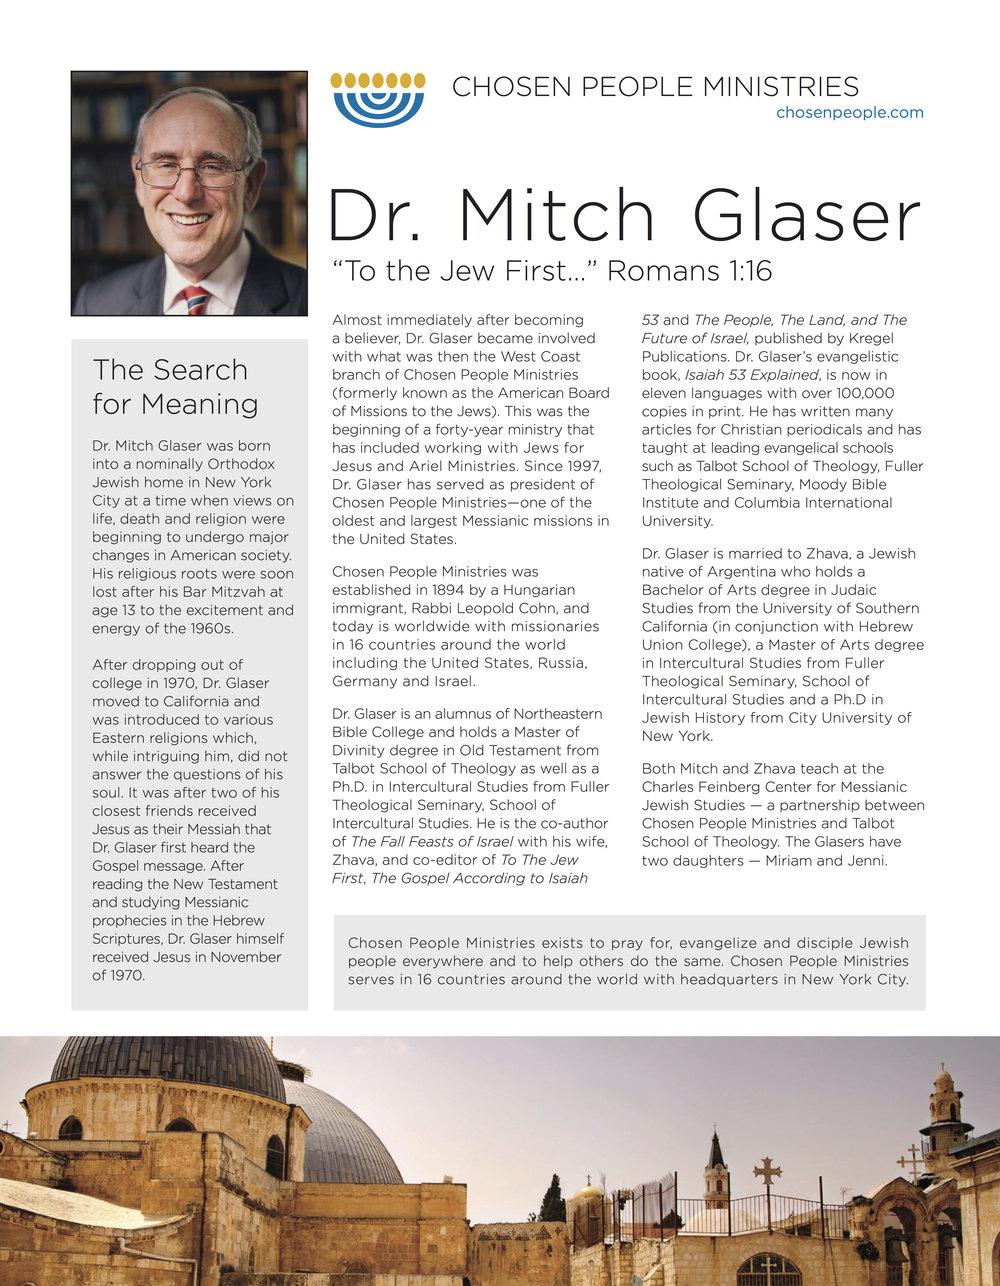 Mitch Glaser rev 4-2016.jpg